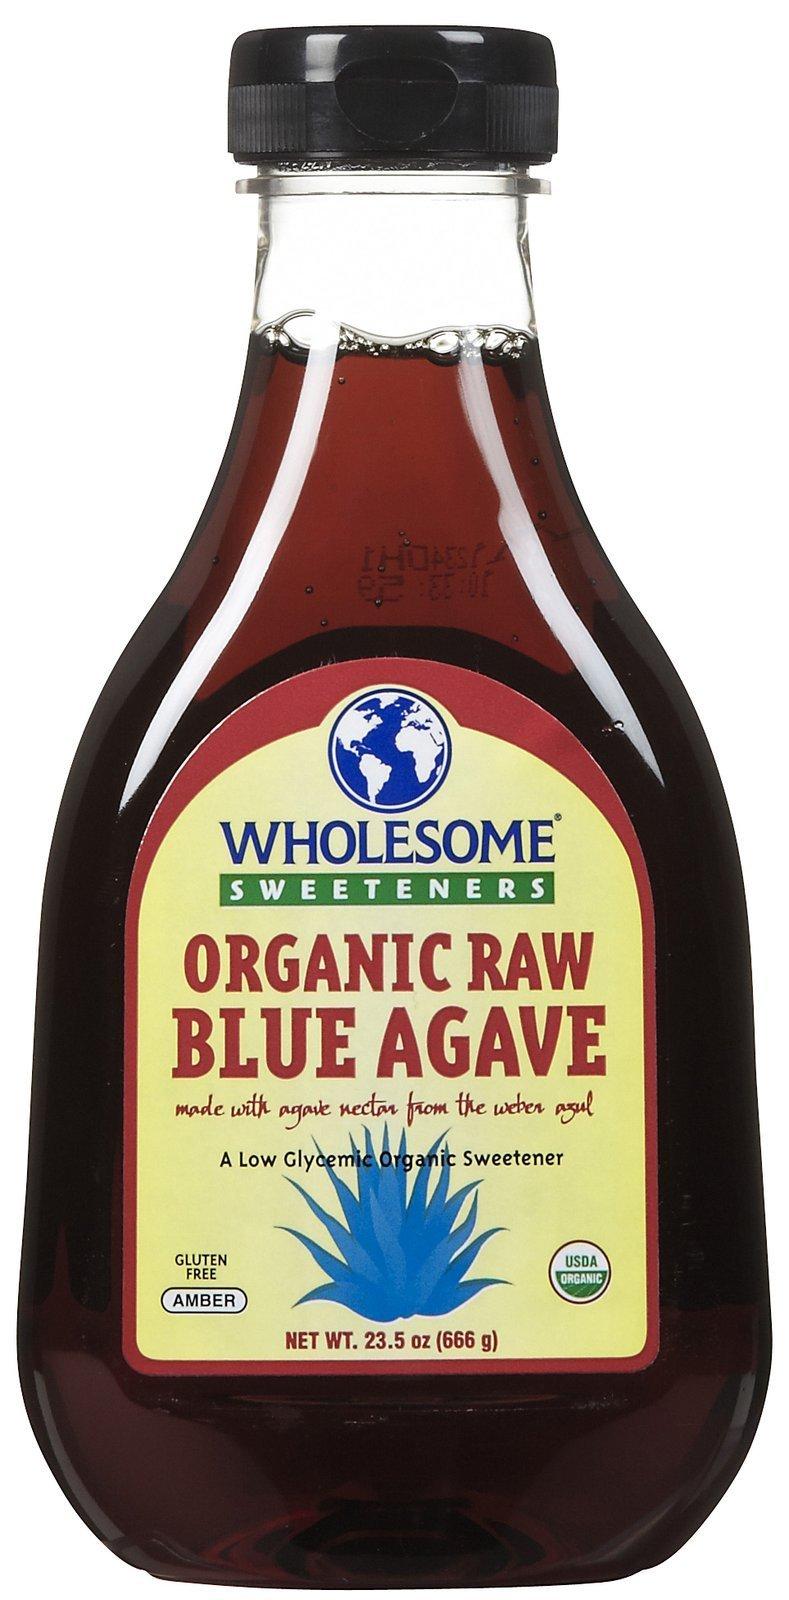 Wholesome Sweeteners Organic Raw Blue Agave, 23.5 oz